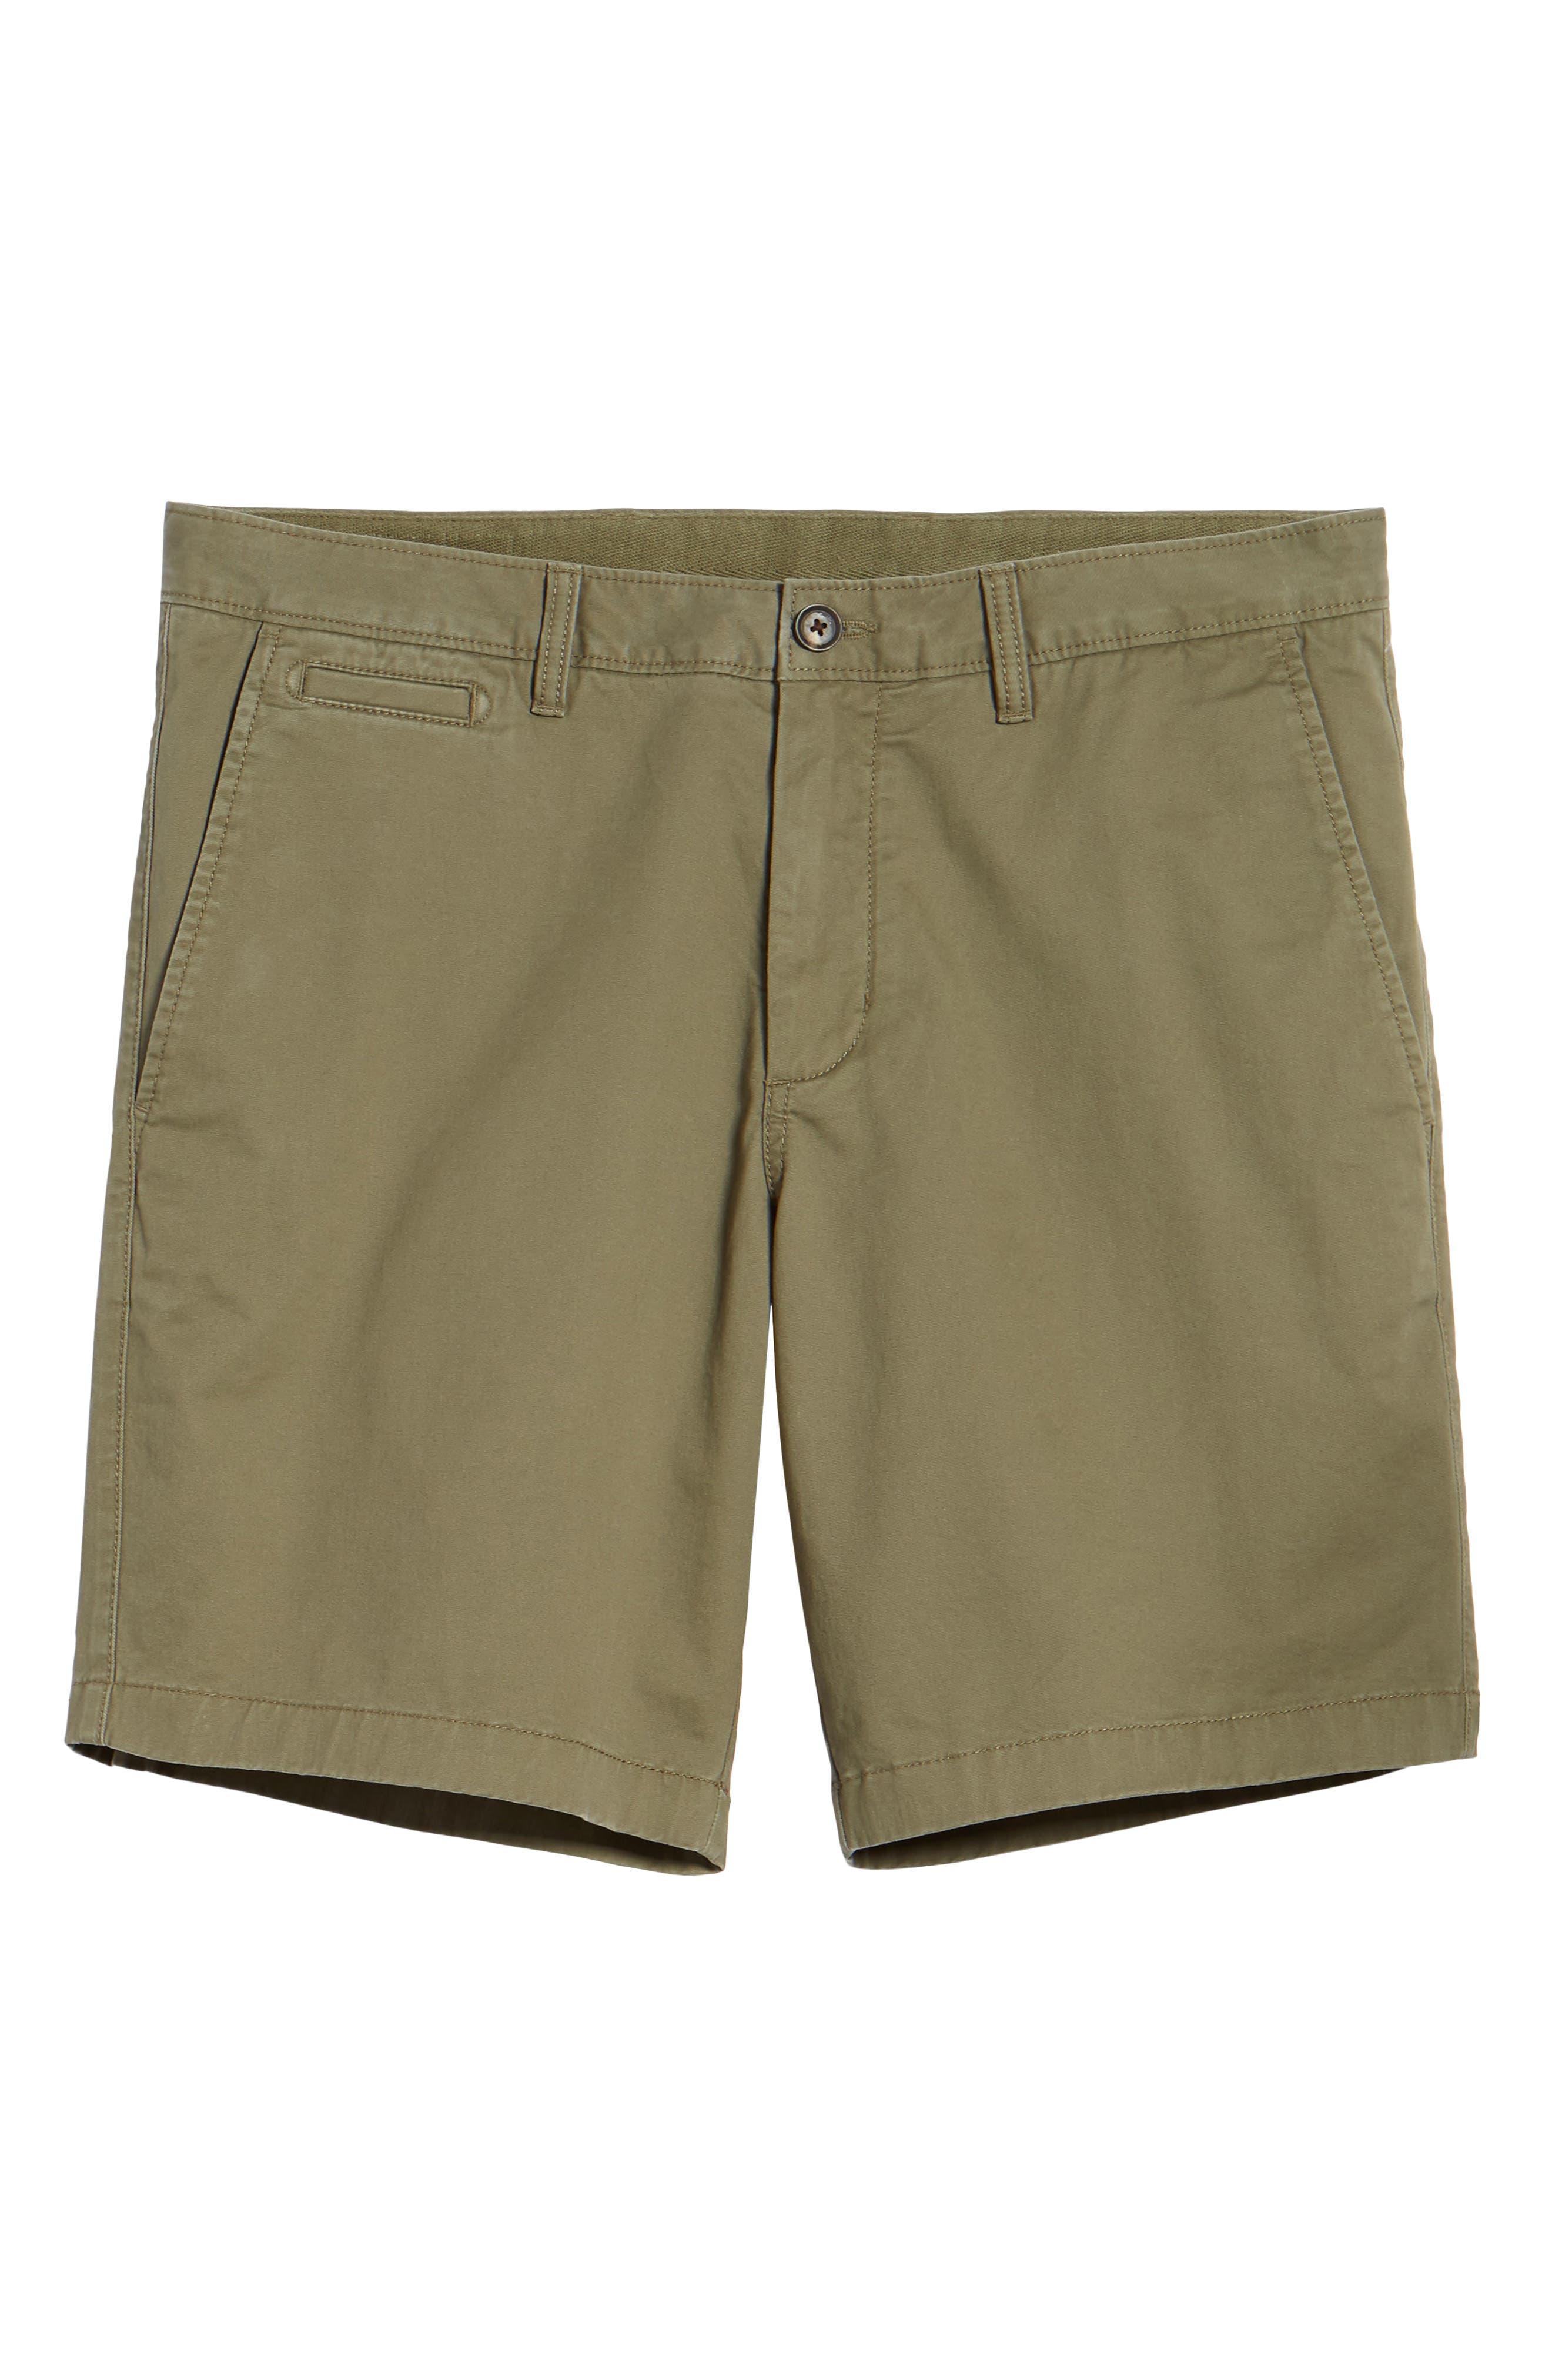 Ballard Slim Fit Stretch Chino 9-Inch Shorts,                             Alternate thumbnail 65, color,